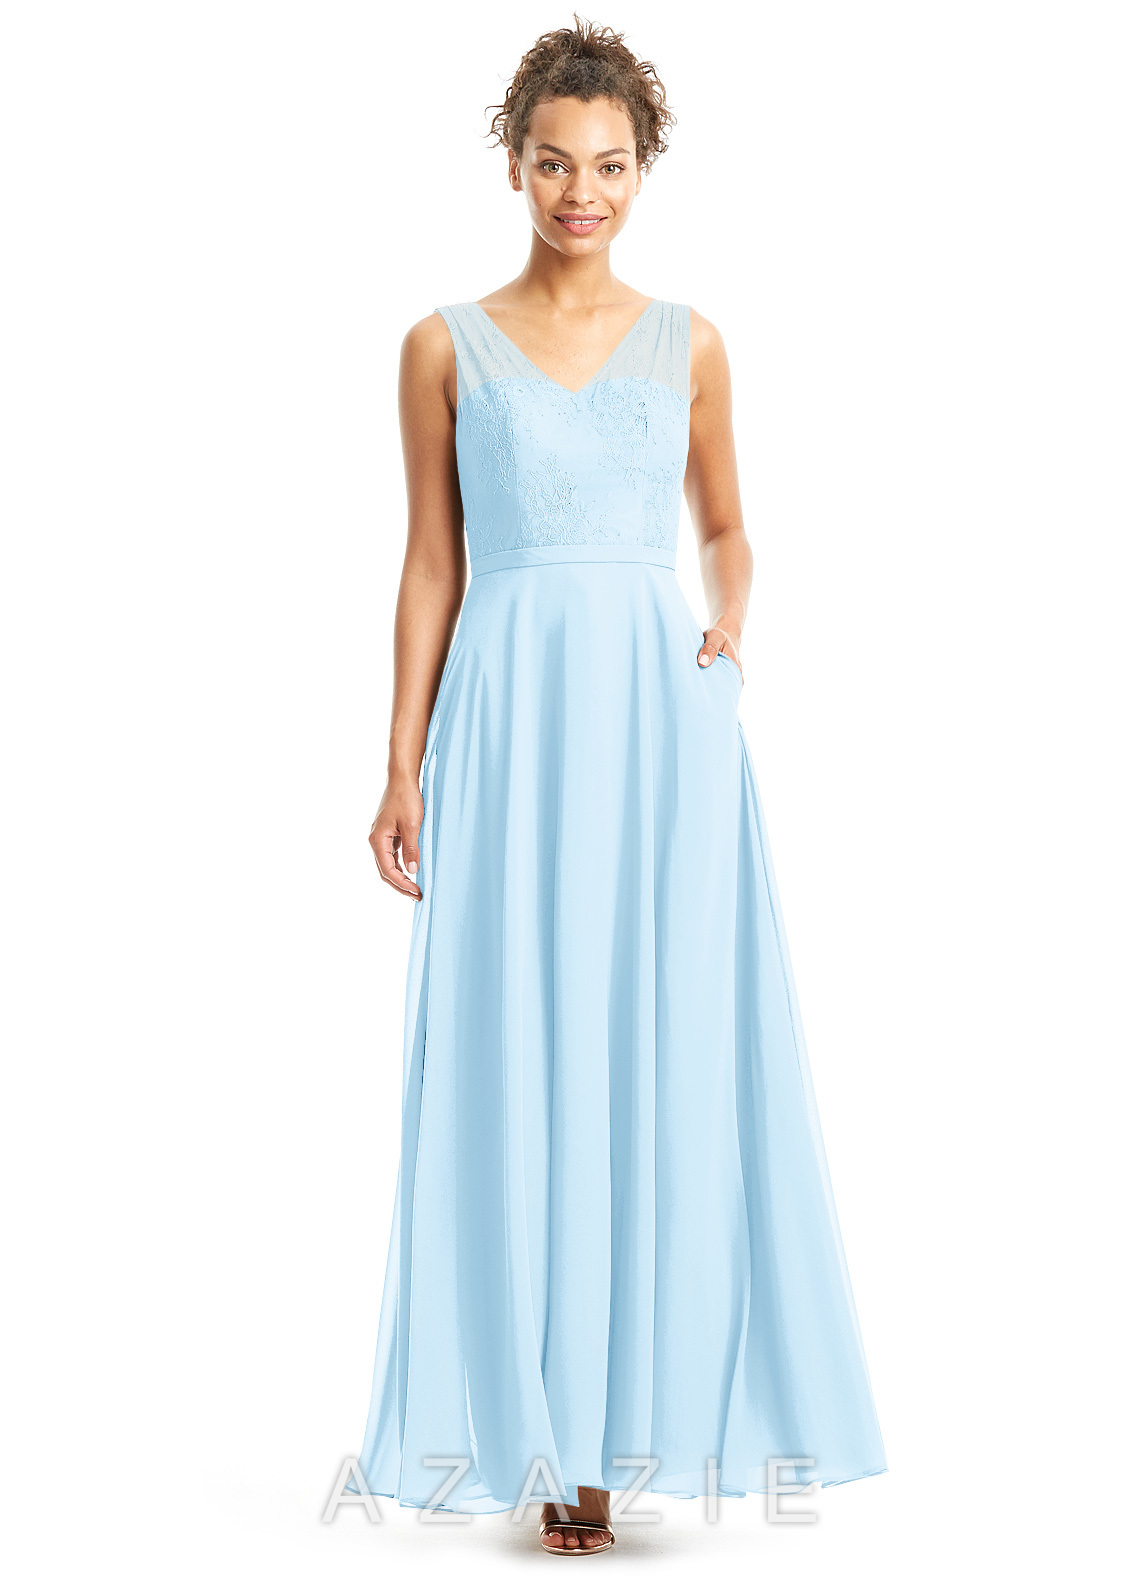 Azazie Eileen Bridesmaid Dress | Azazie - photo #1